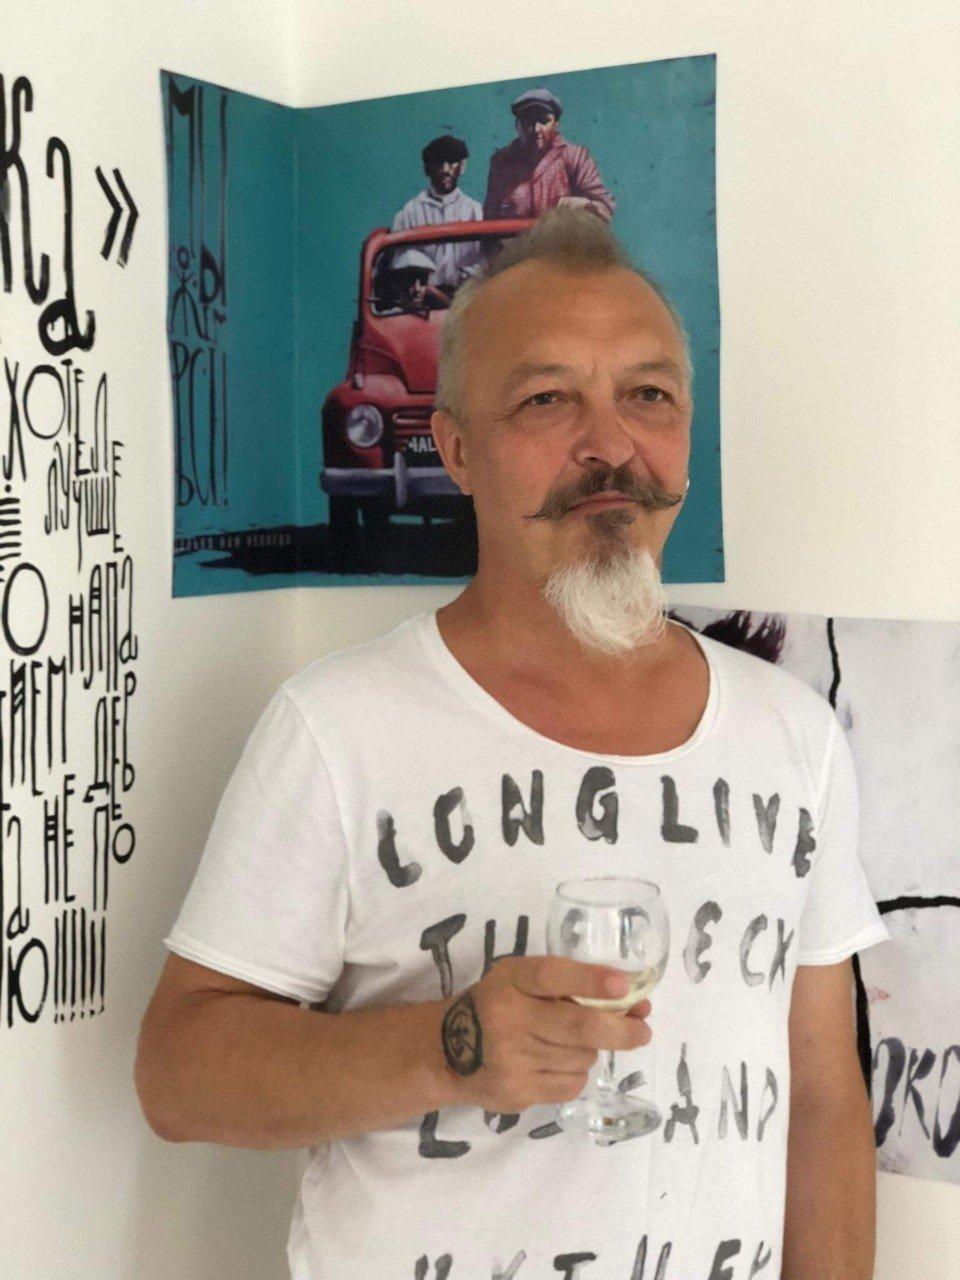 Forum SlovoNovo Igor Andrianov (Shulman) exhibition